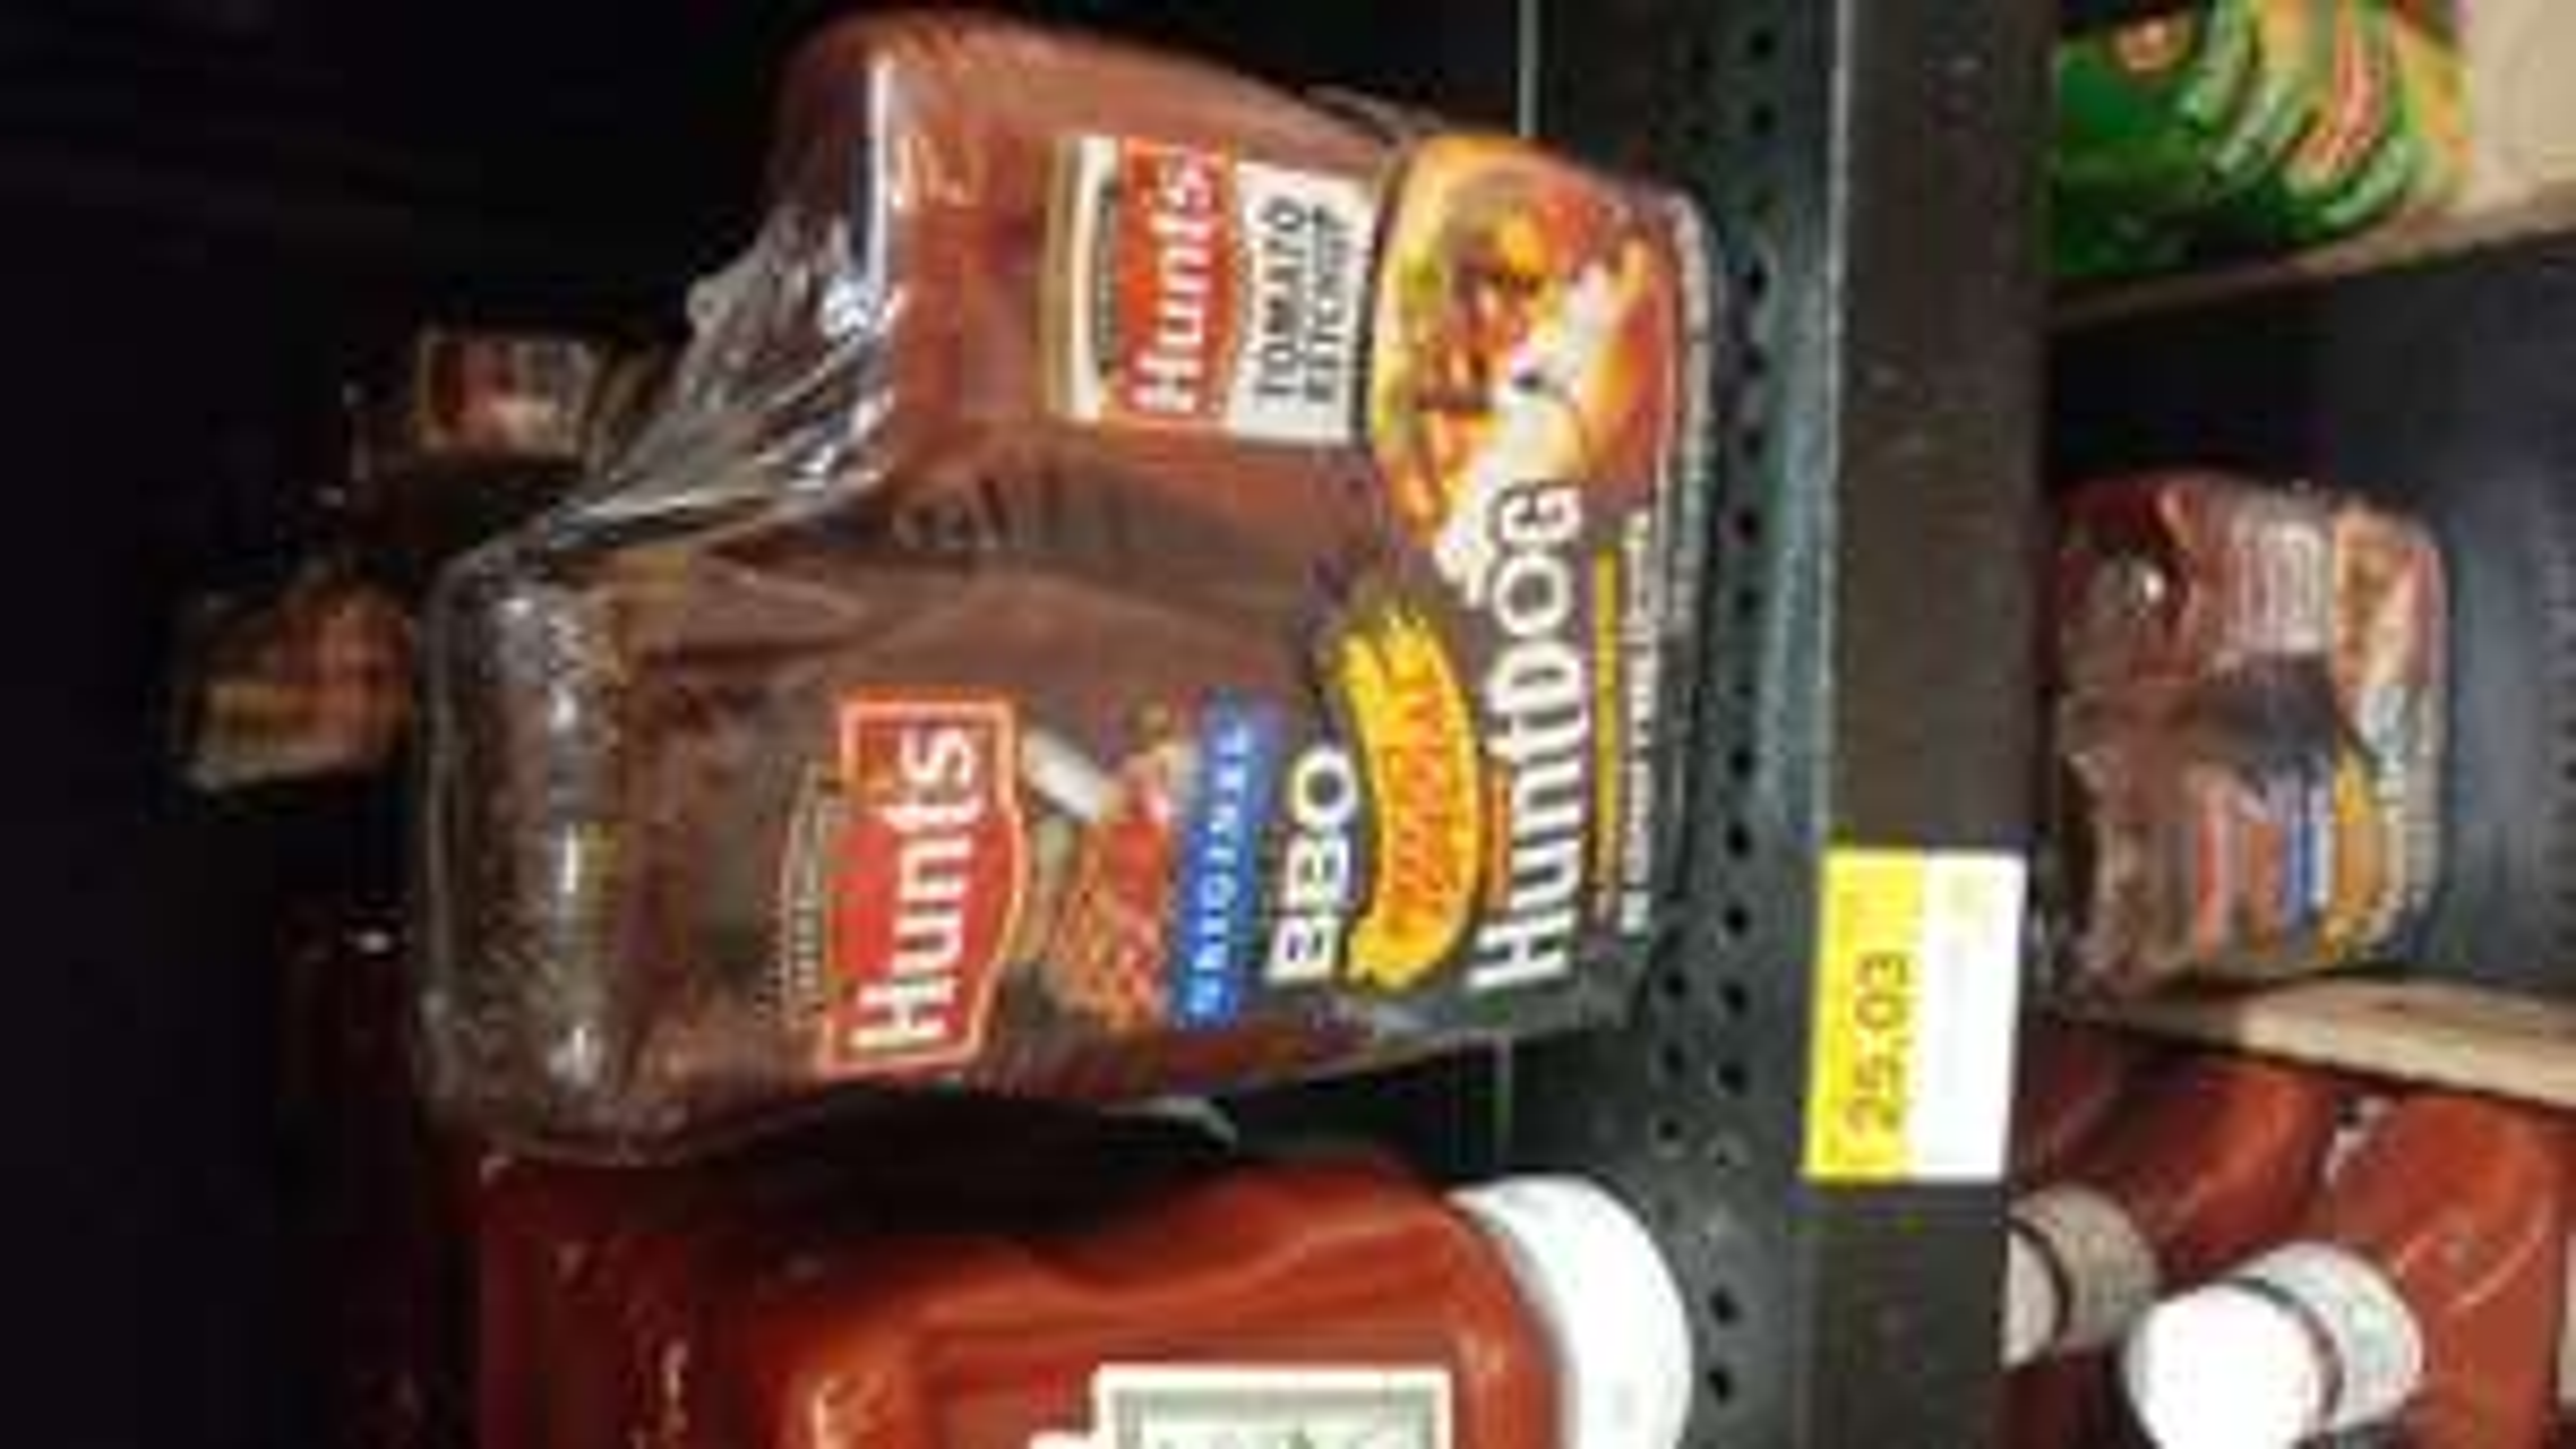 Walmart: hunts BBQ y Catsup a $25.03